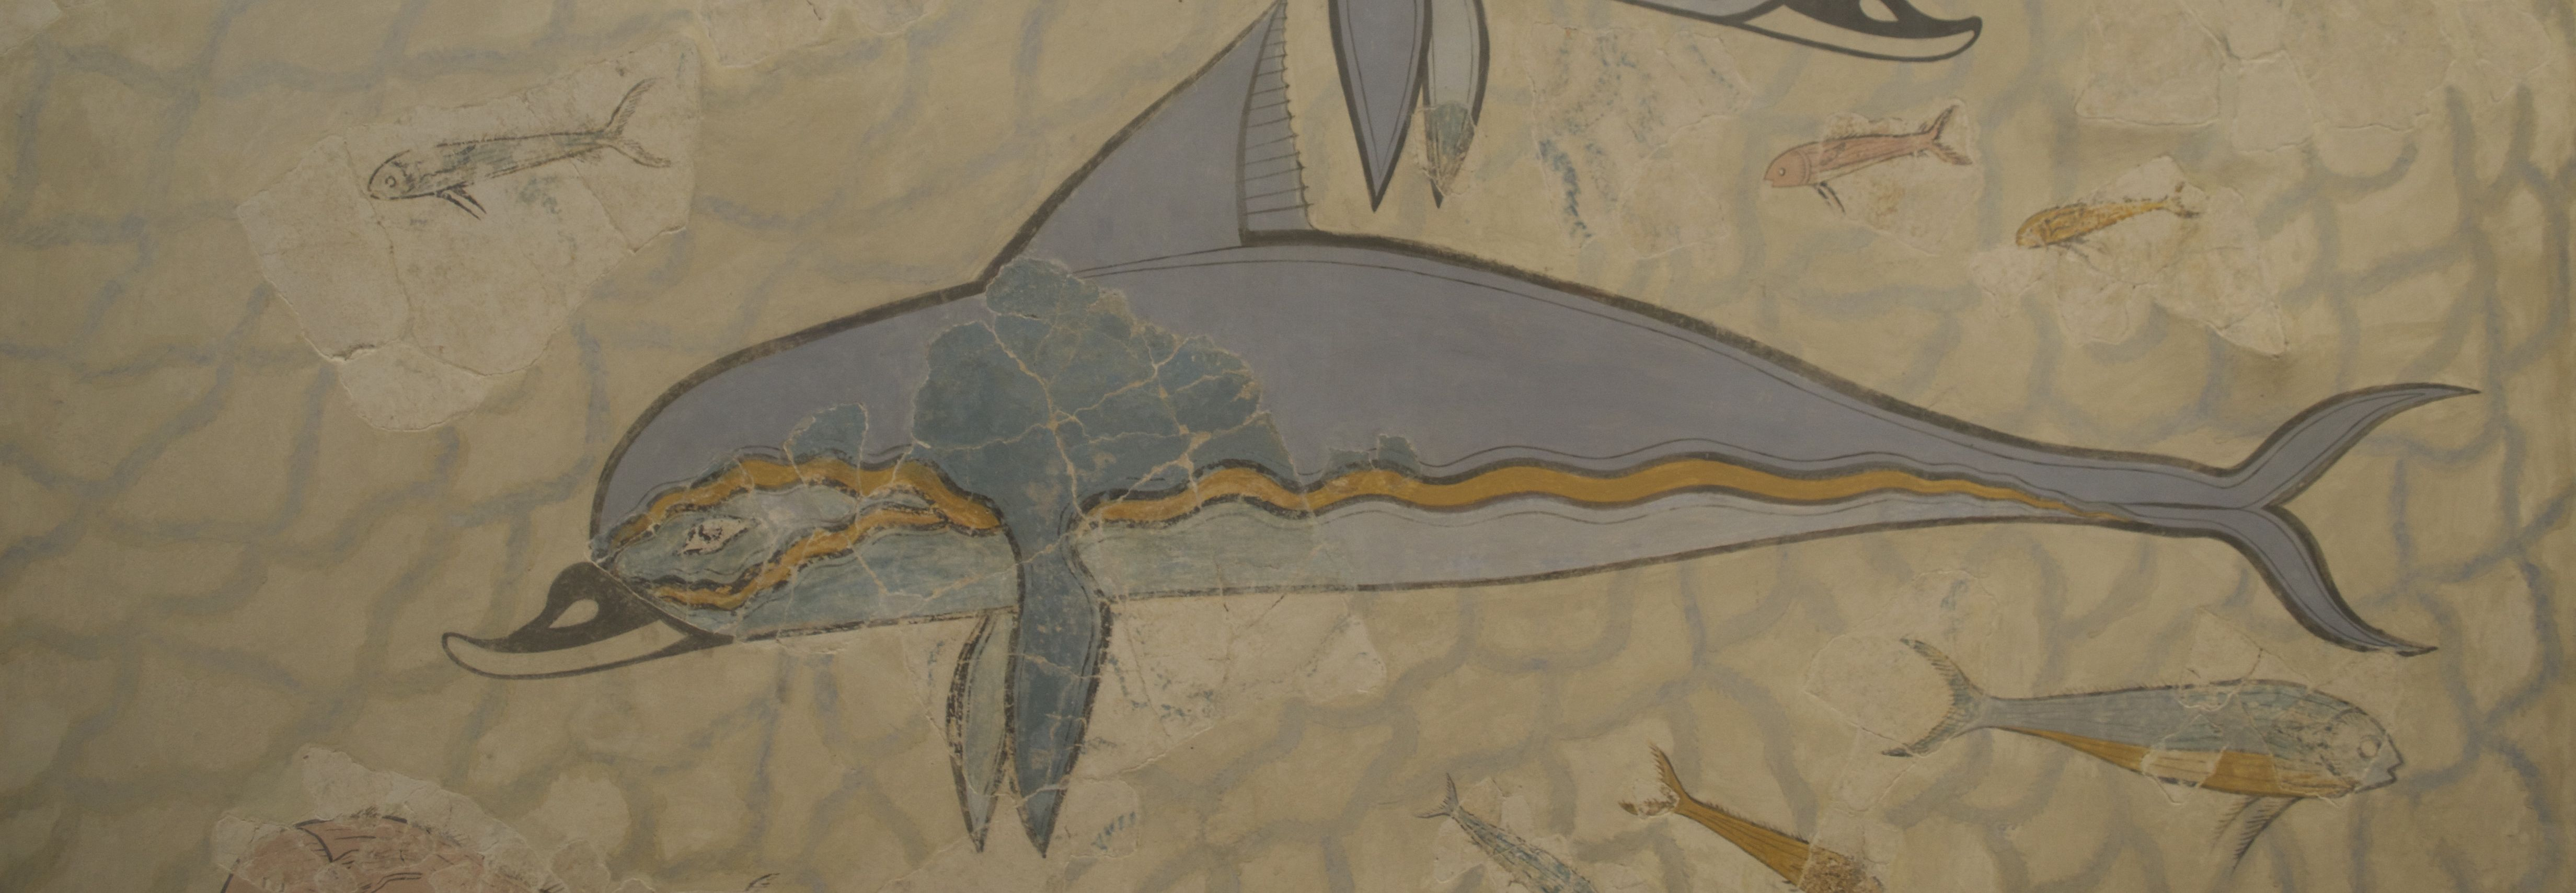 Delfin_Mosaik_Knossos